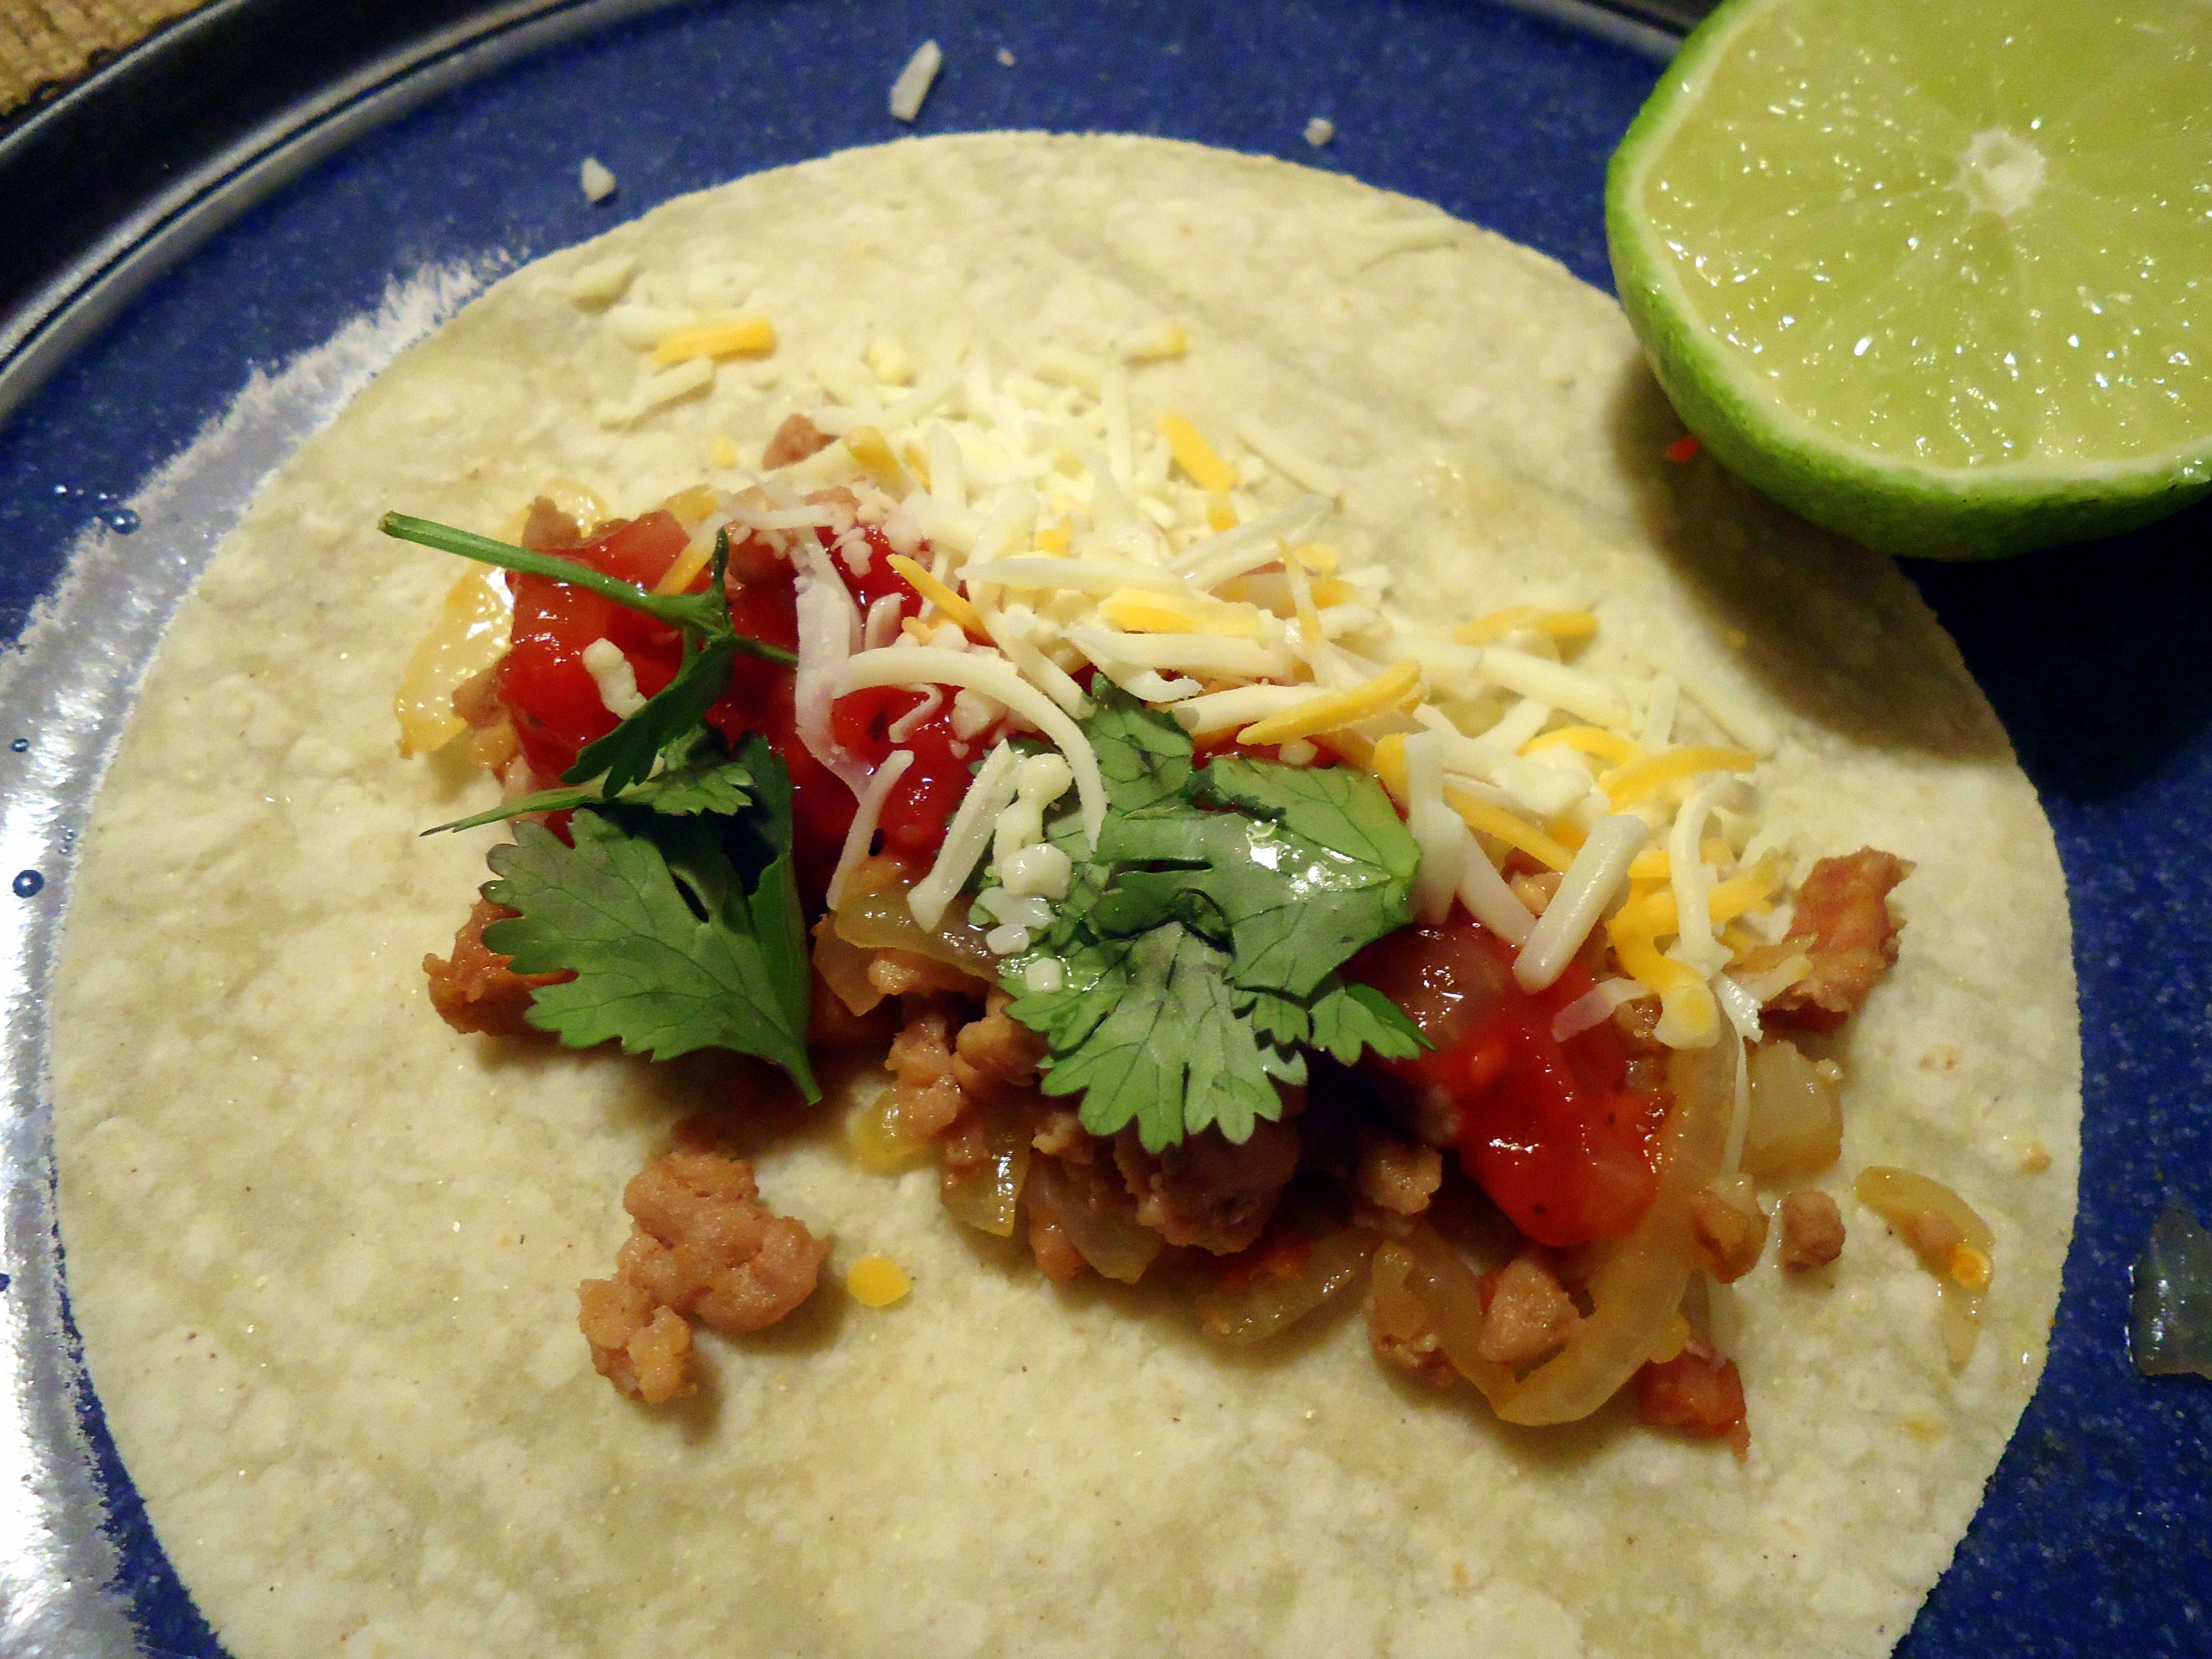 Turkey-Chorizo tacos.  Mmmm.